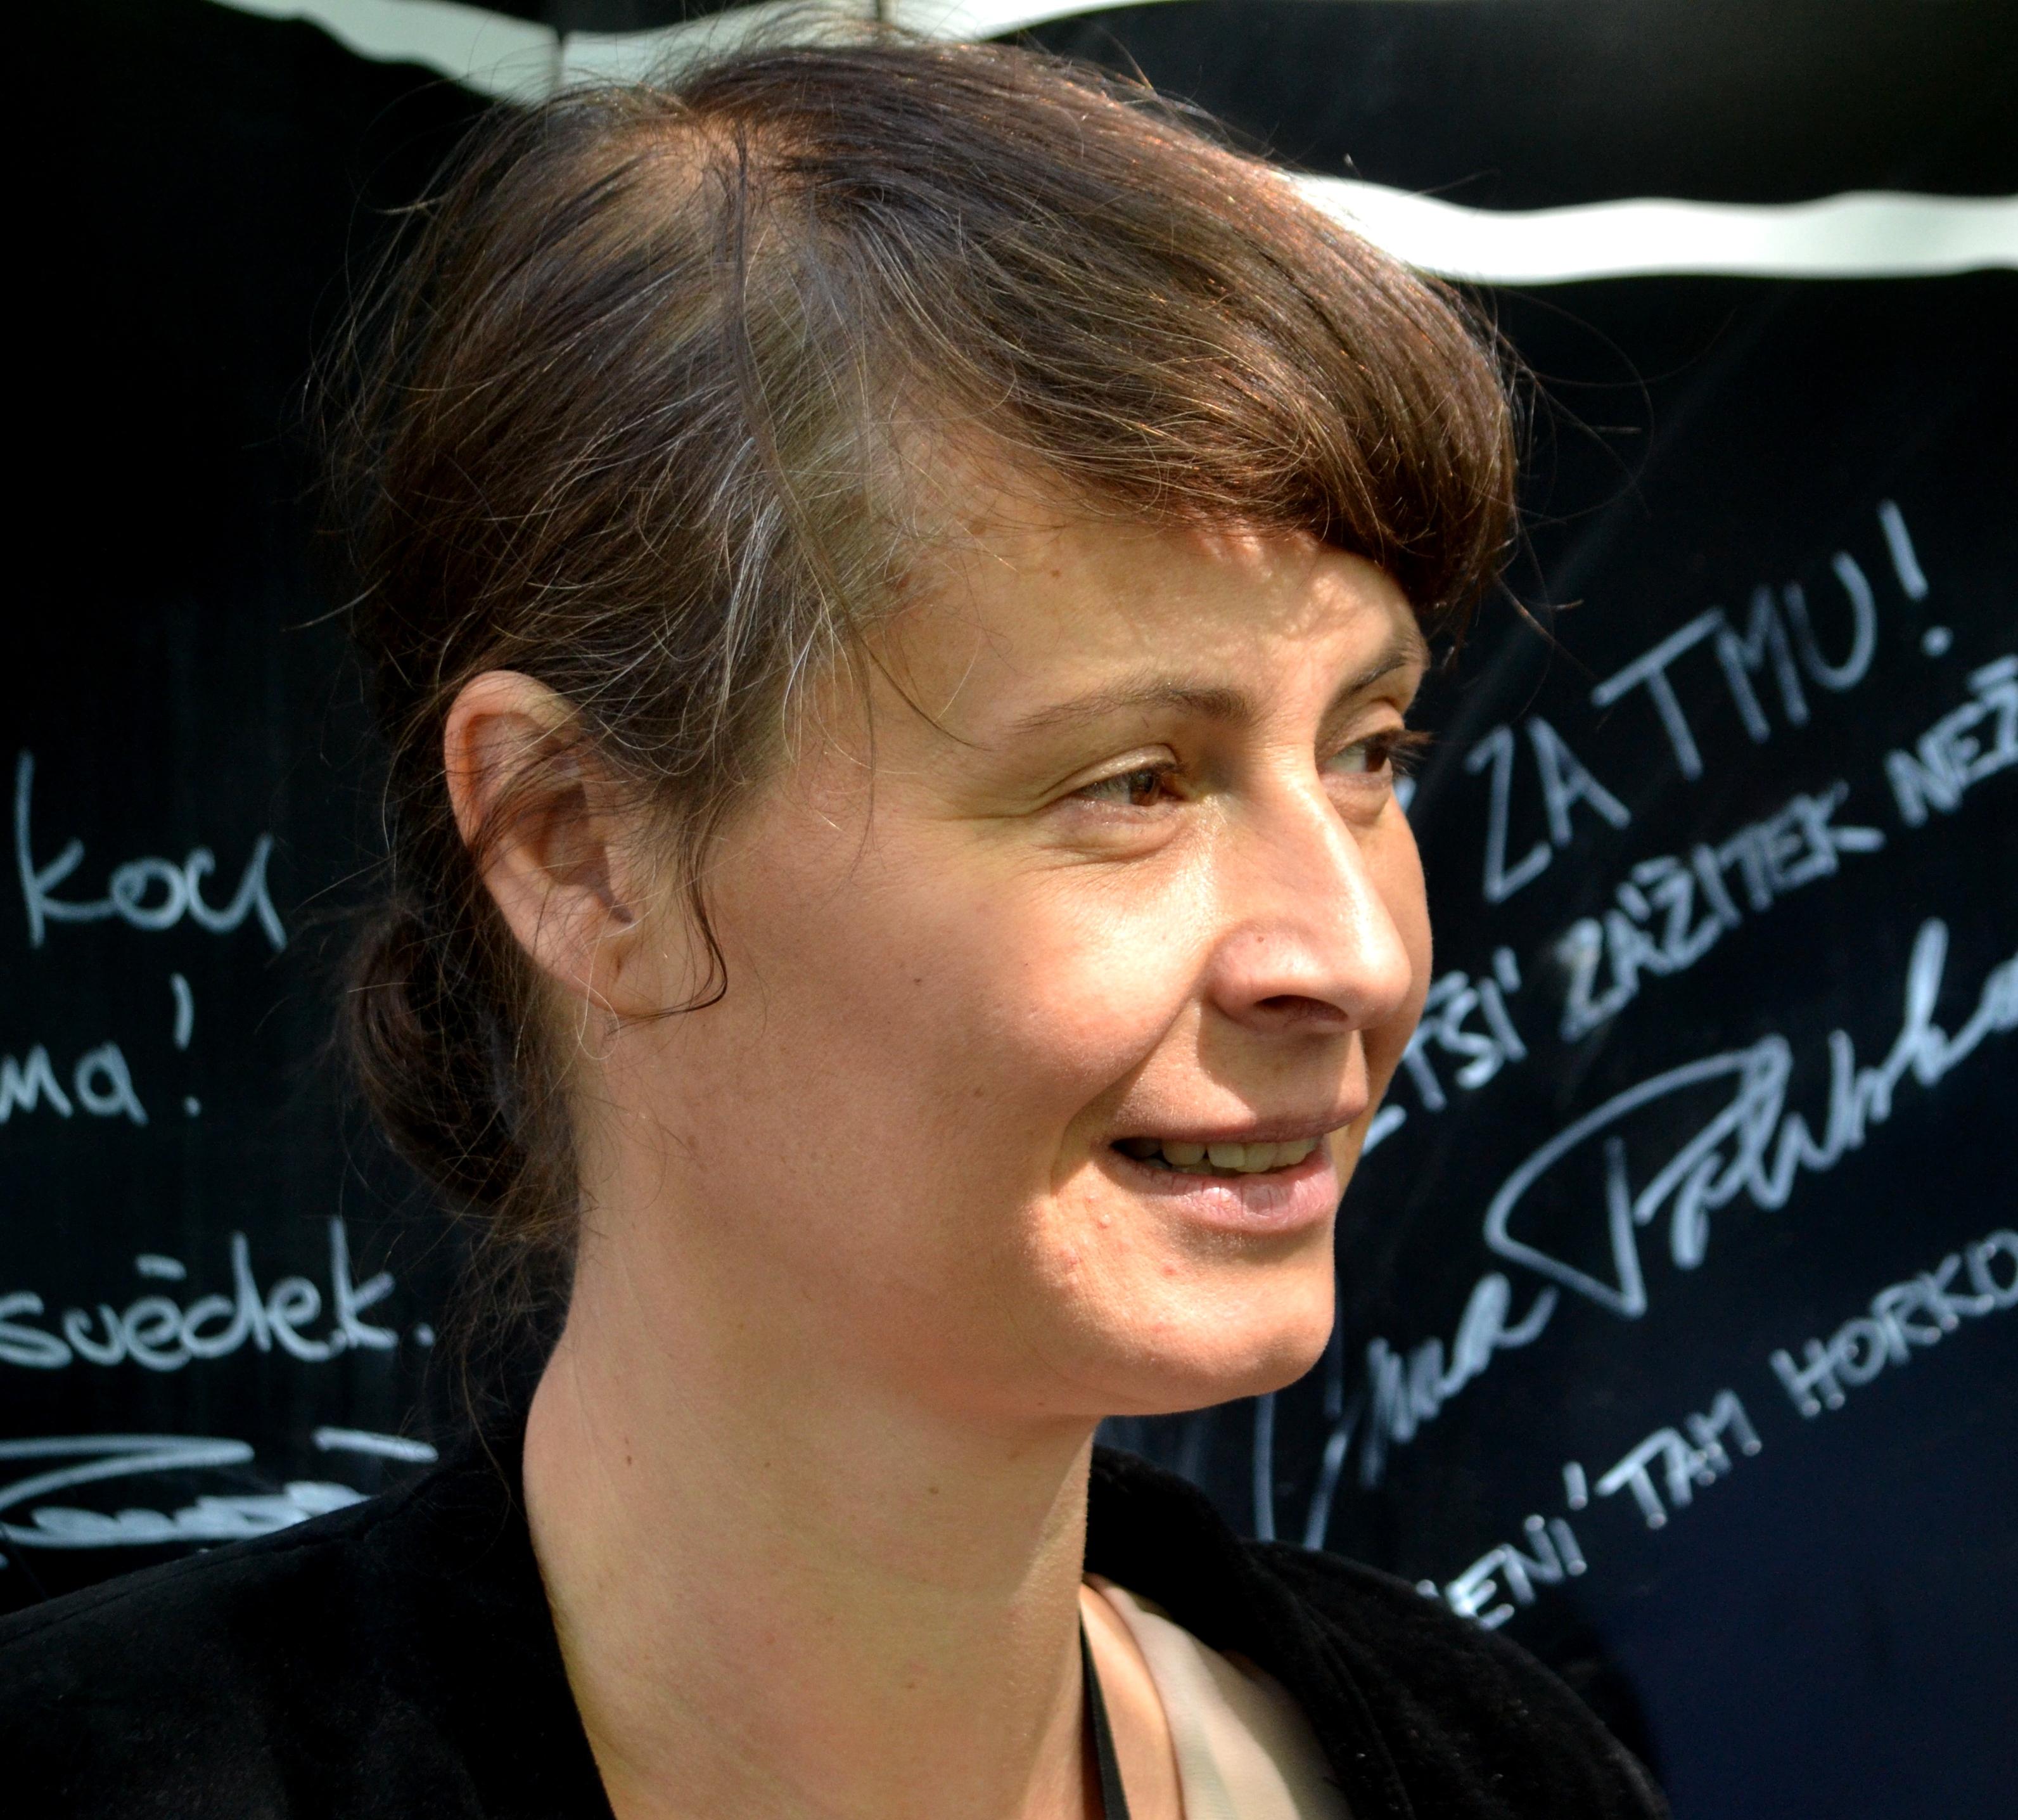 Lenka Vlasakova